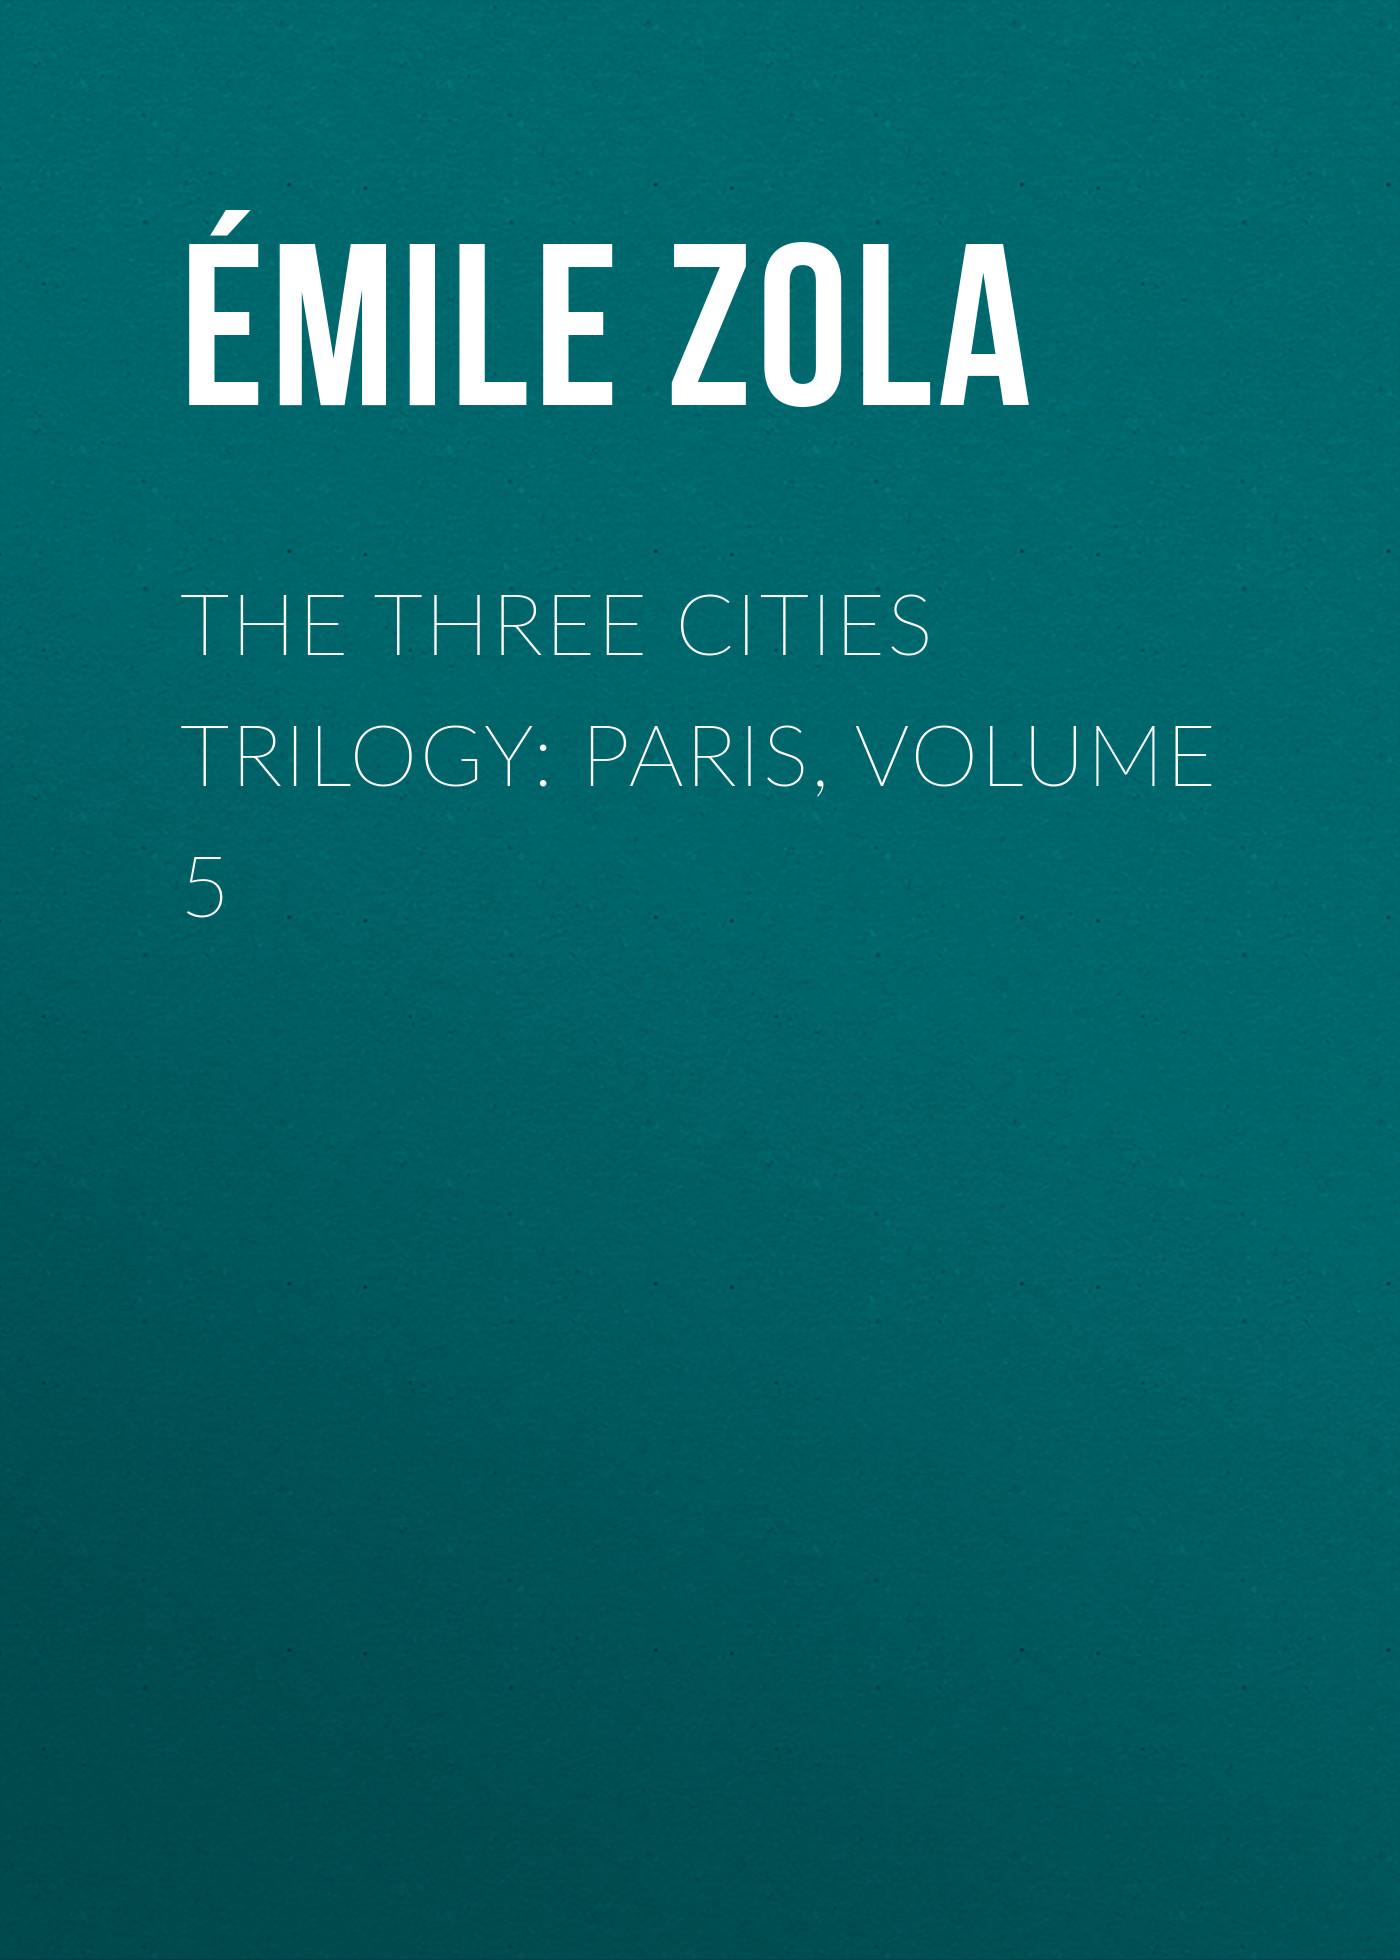 Эмиль Золя The Three Cities Trilogy: Paris, Volume 5 эмиль золя the three cities trilogy complete